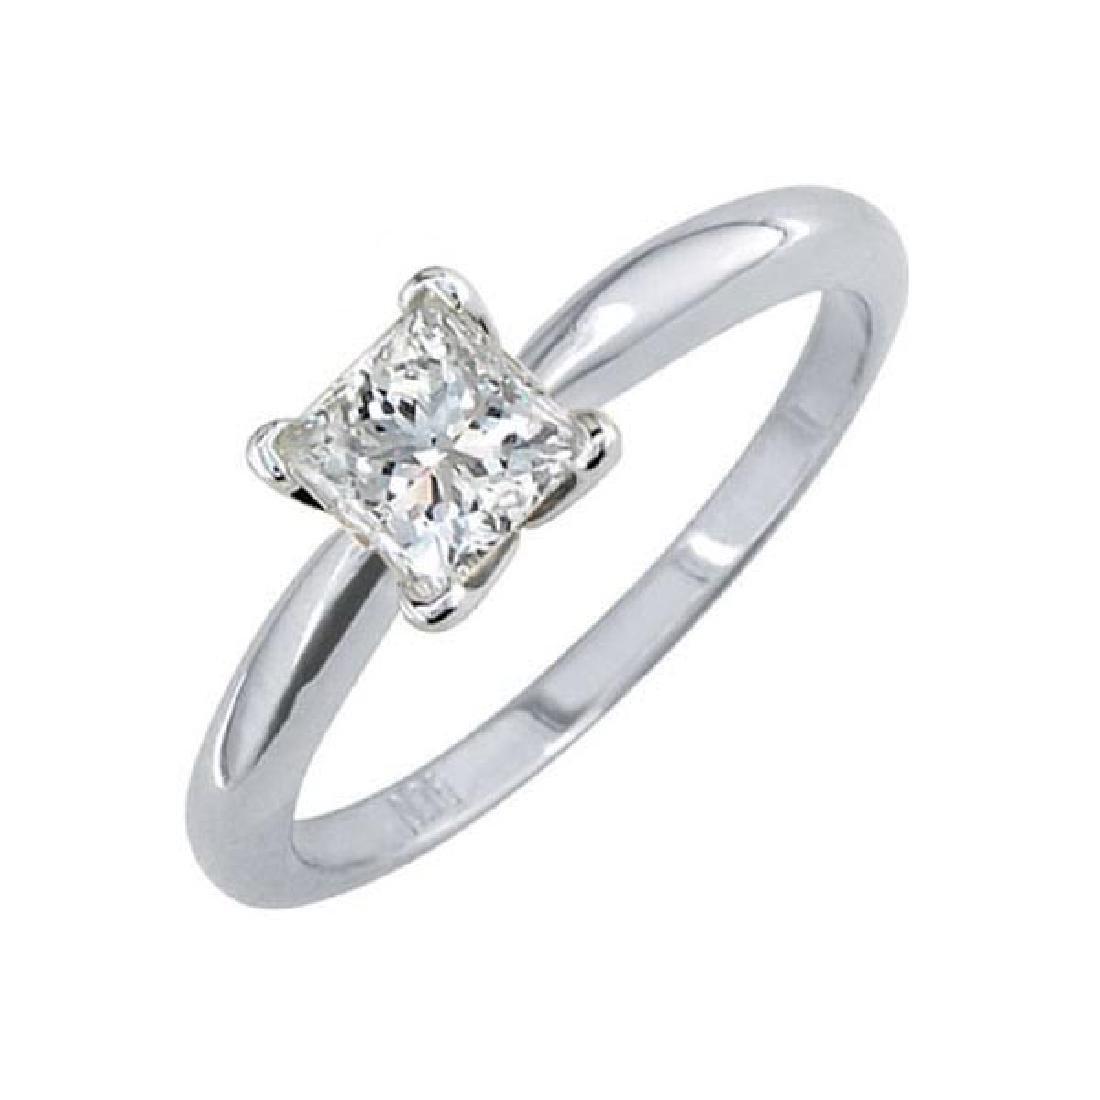 Certified 0.55 CTW Princess Diamond Solitaire 14k Ring